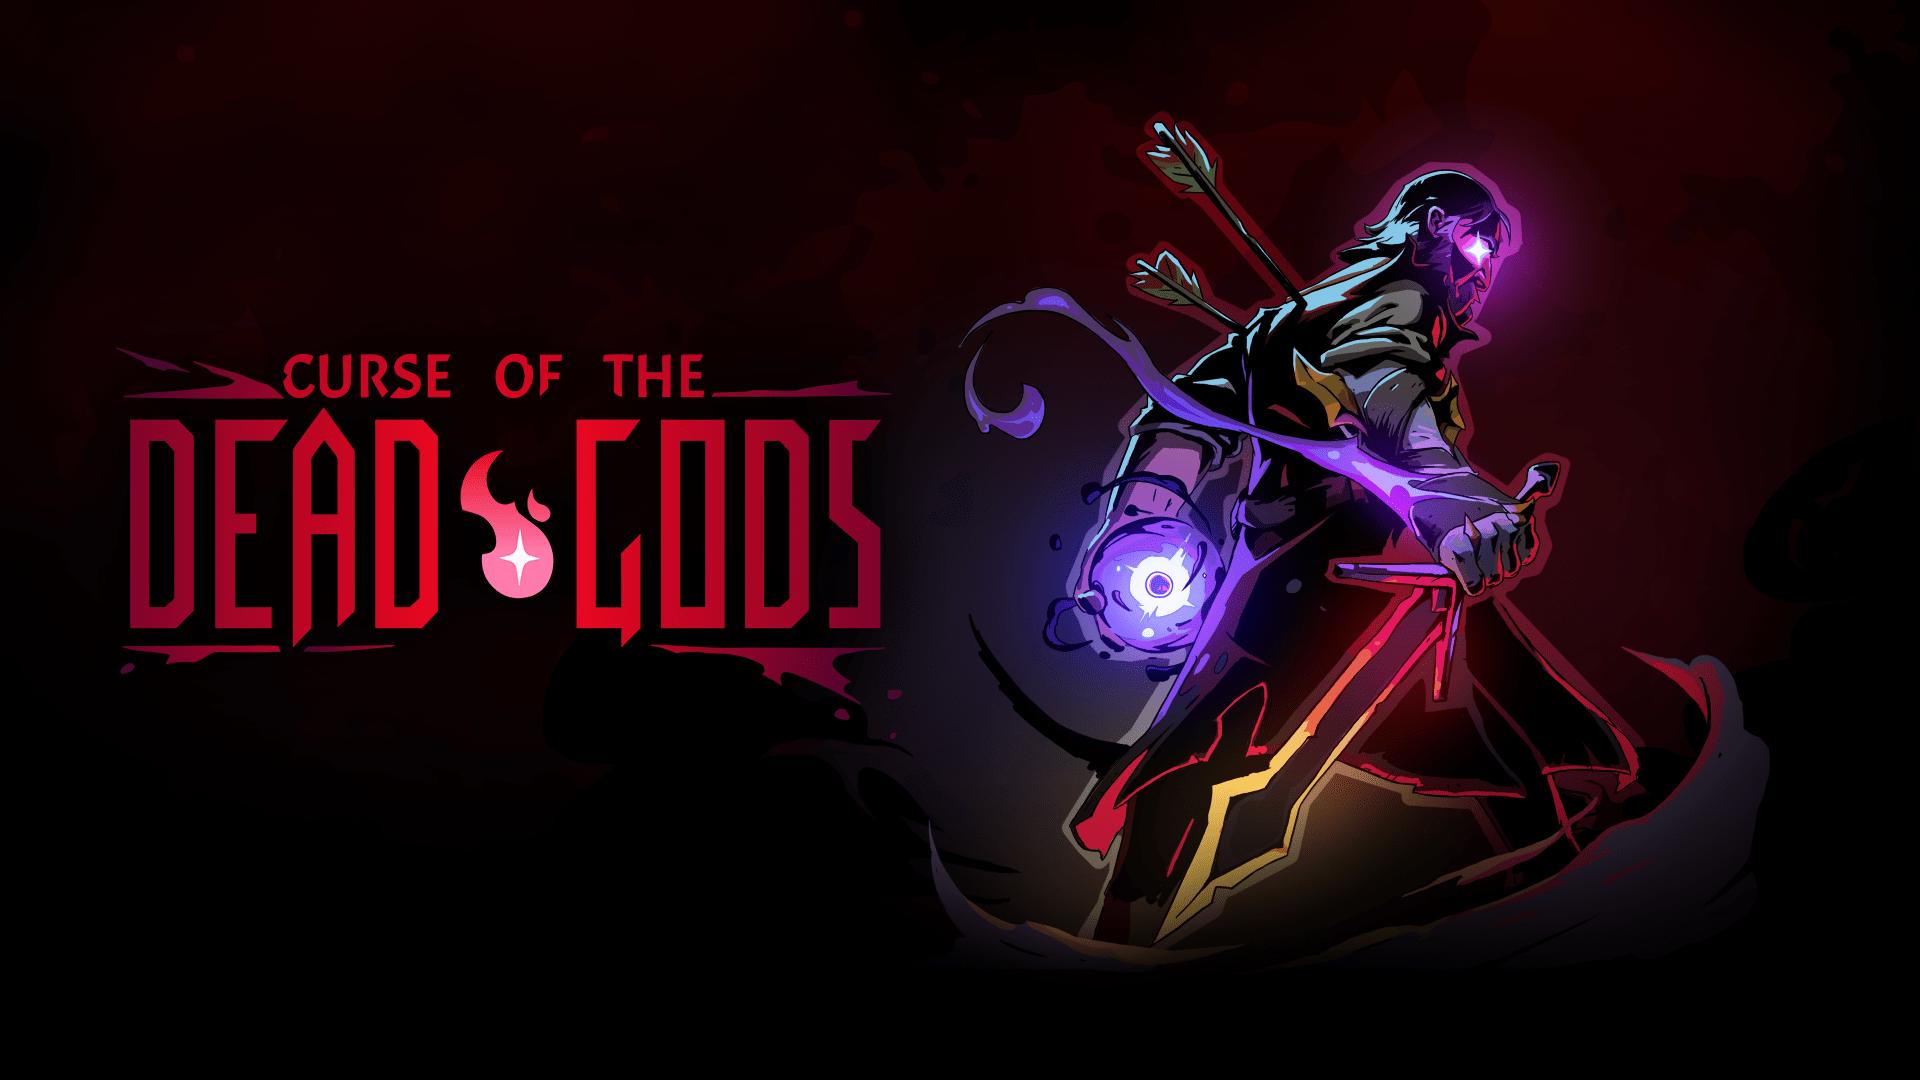 Разработчики Curse of the Dead Gods анонсировали коллаборацию с Dead Cells 6